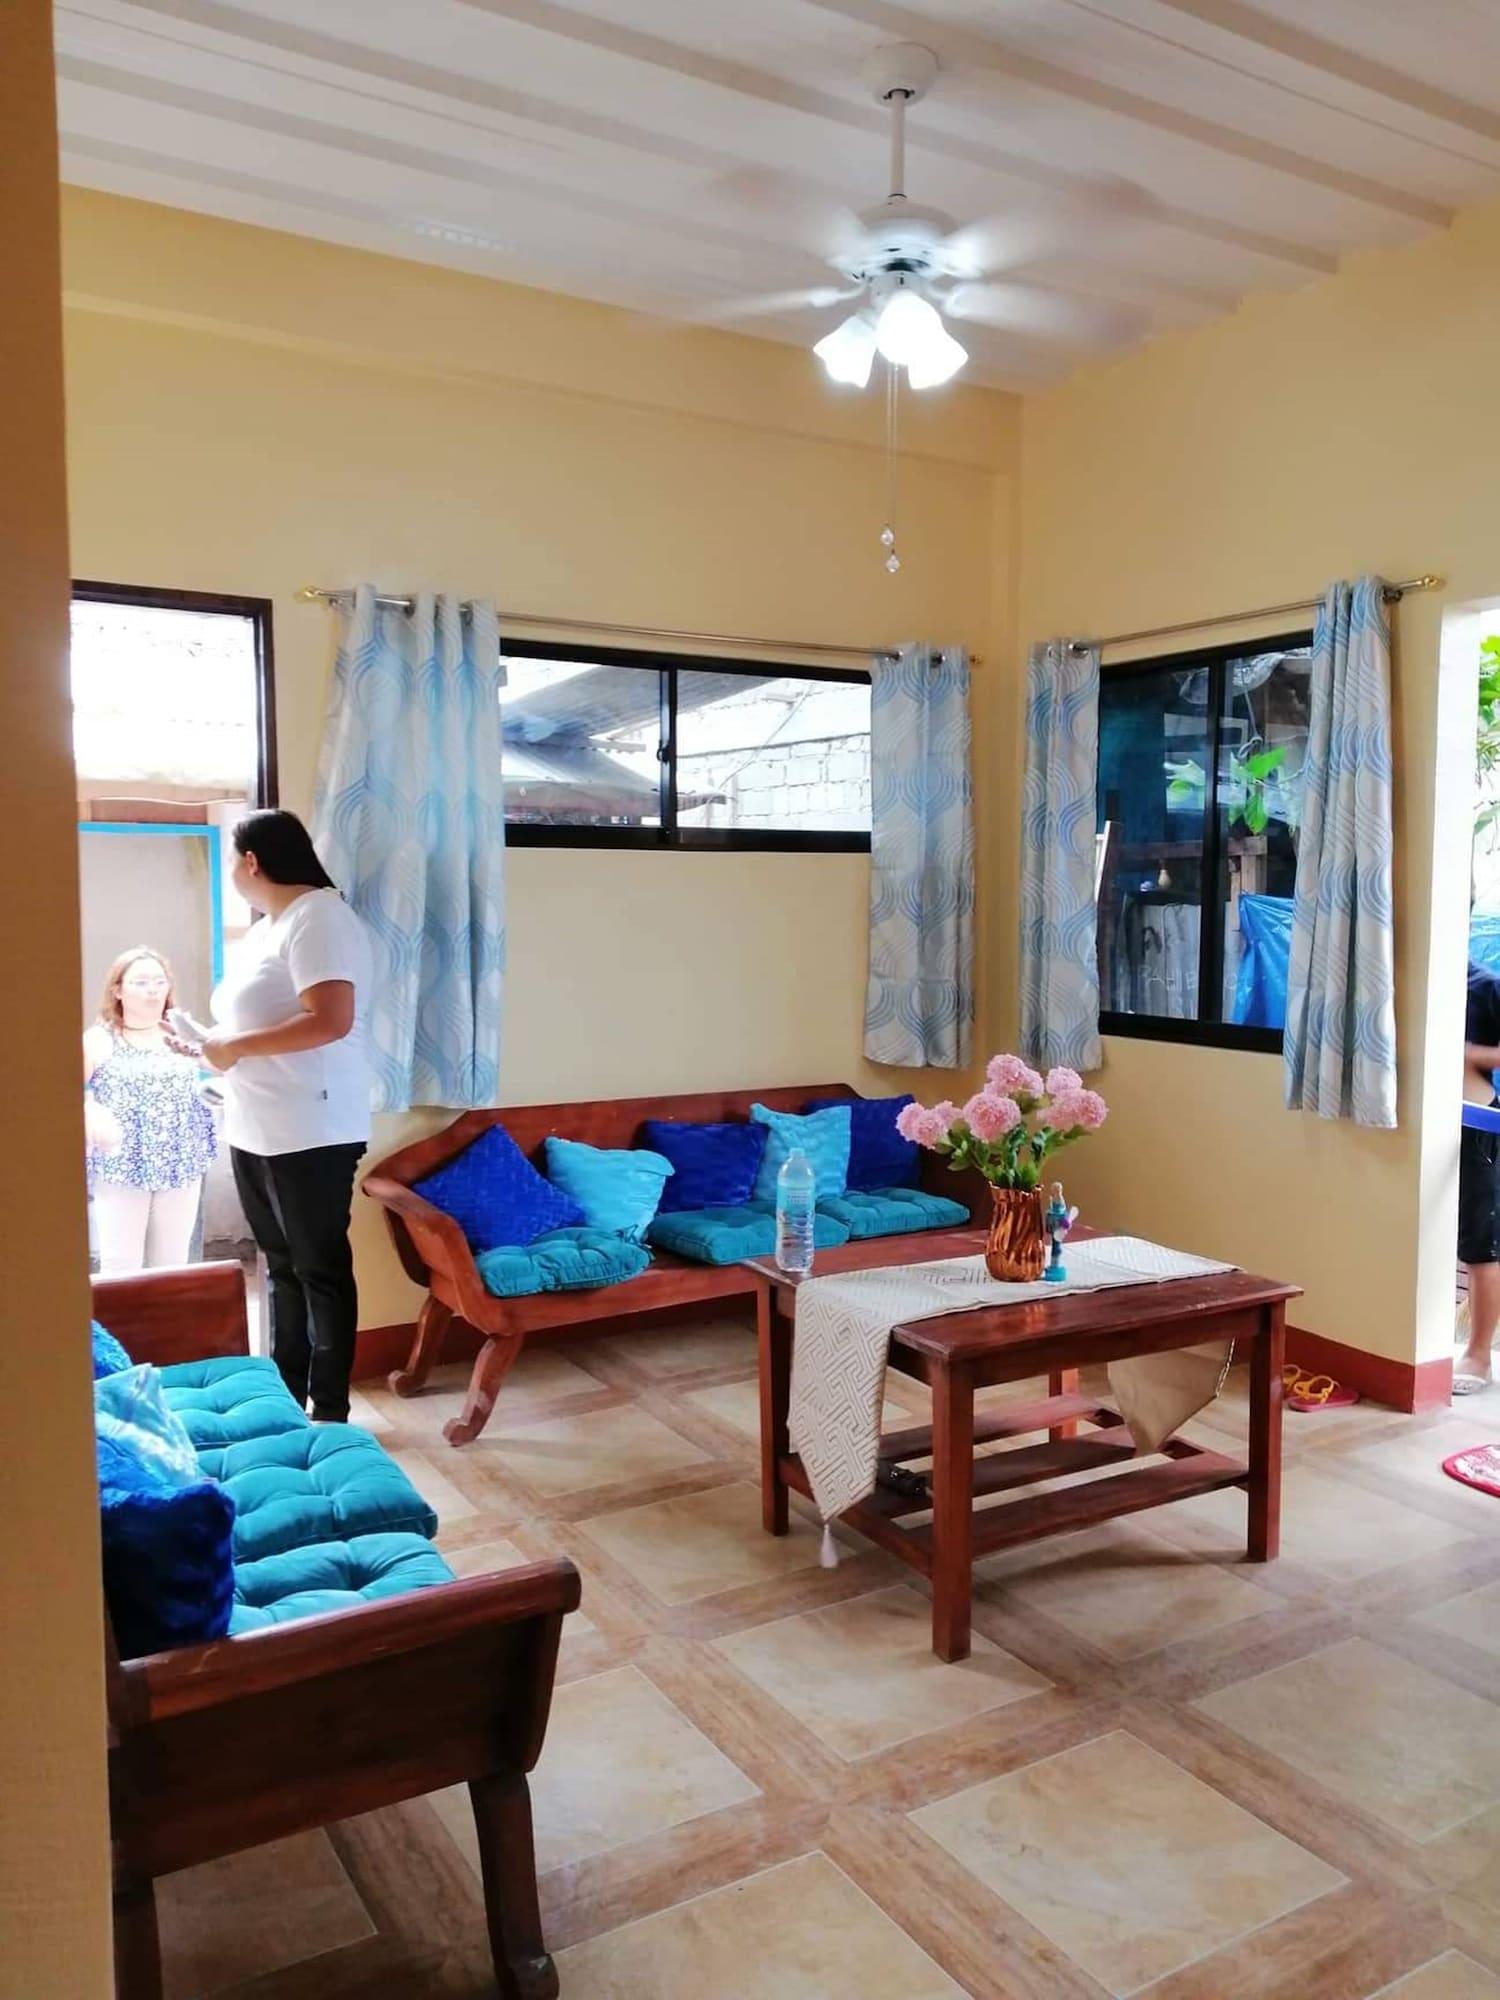 Yolly's Tourist Inn - Hostel, General Luna